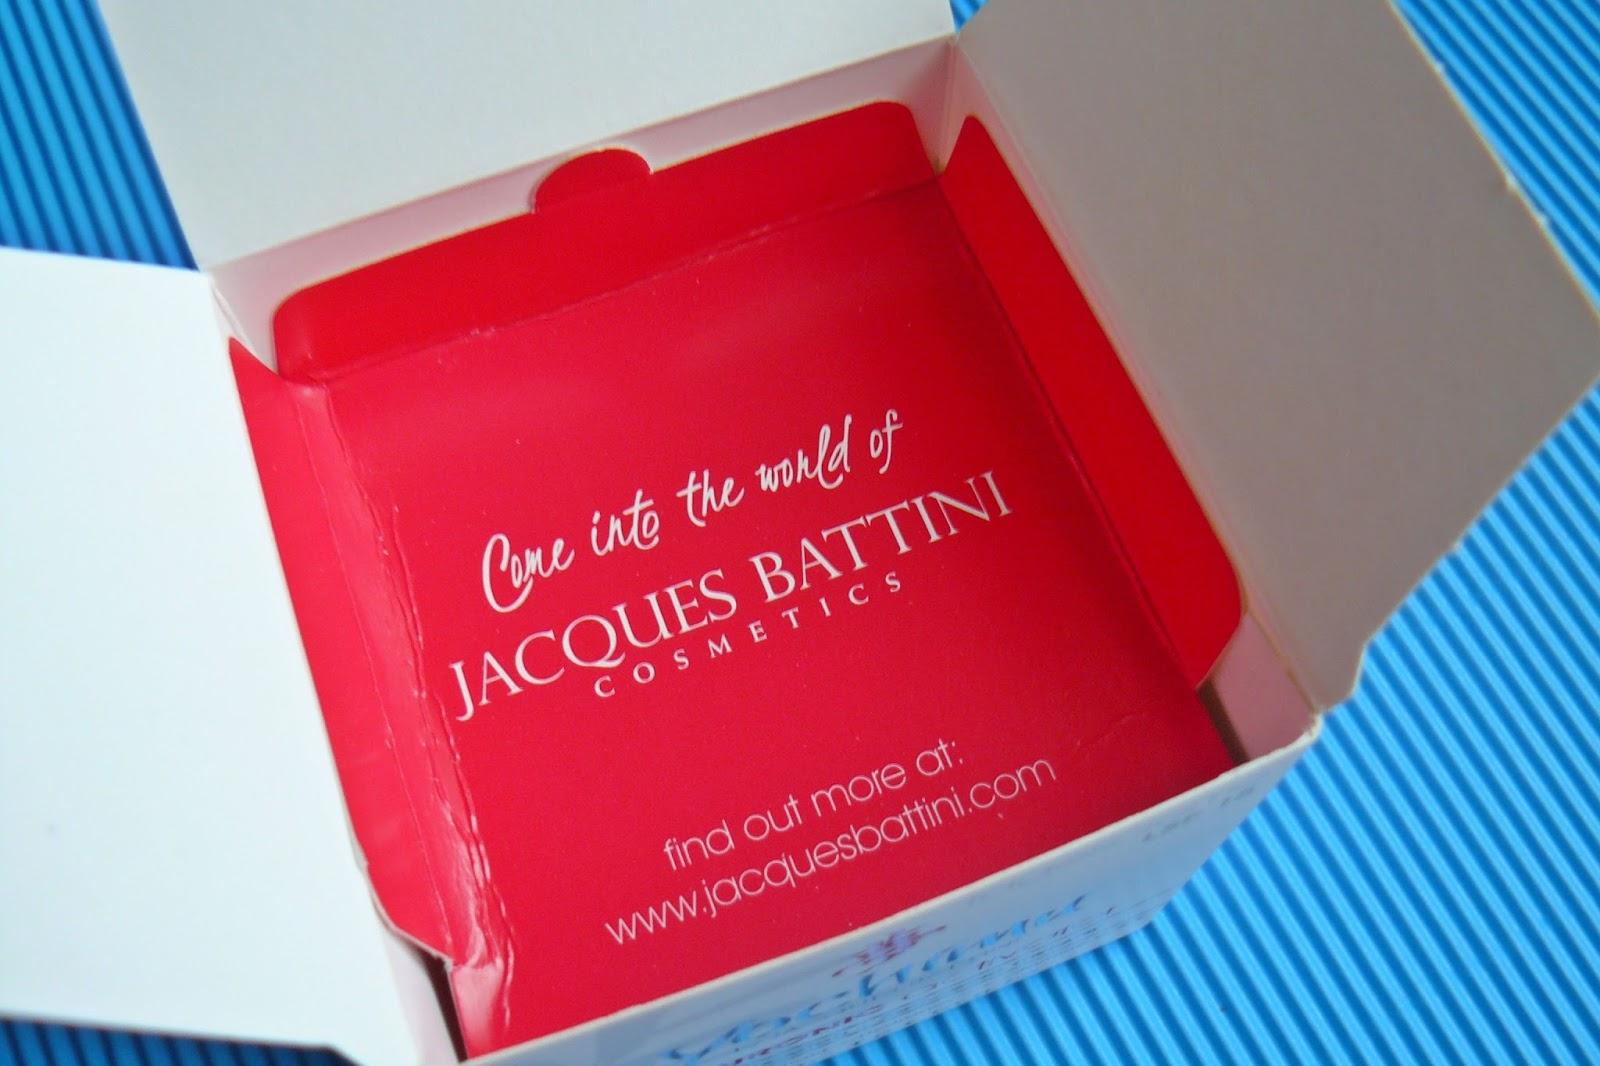 YOCHIMU BY JACQUES BATTINI - CZĘŚĆ I